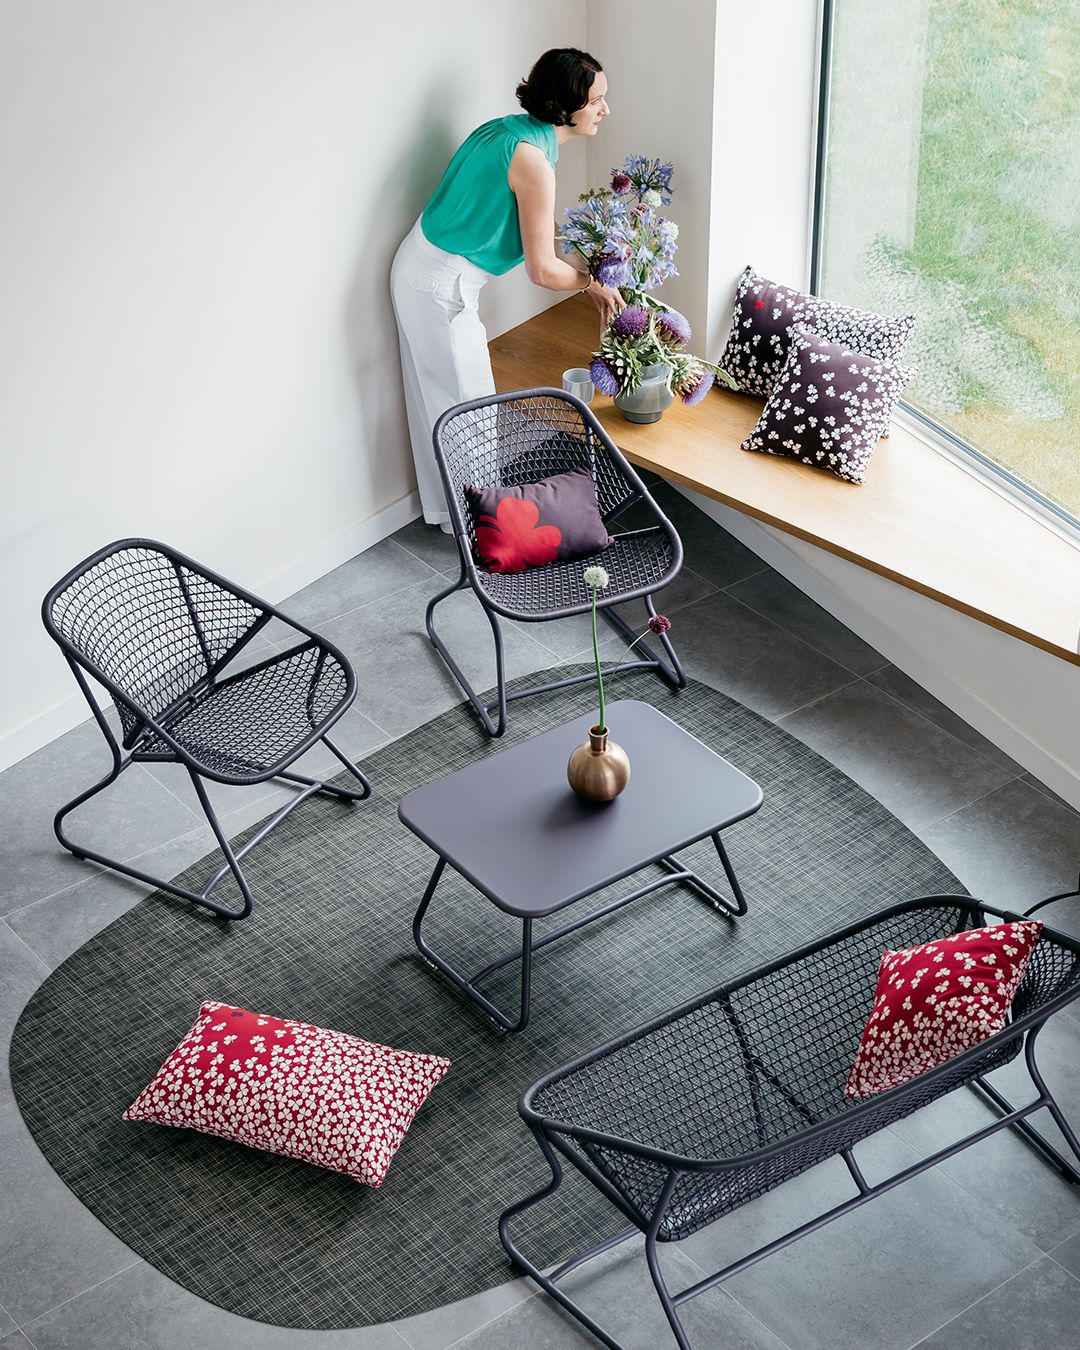 Collection Sixties - Fermob - salon de jardin in 2019 | Mobbing